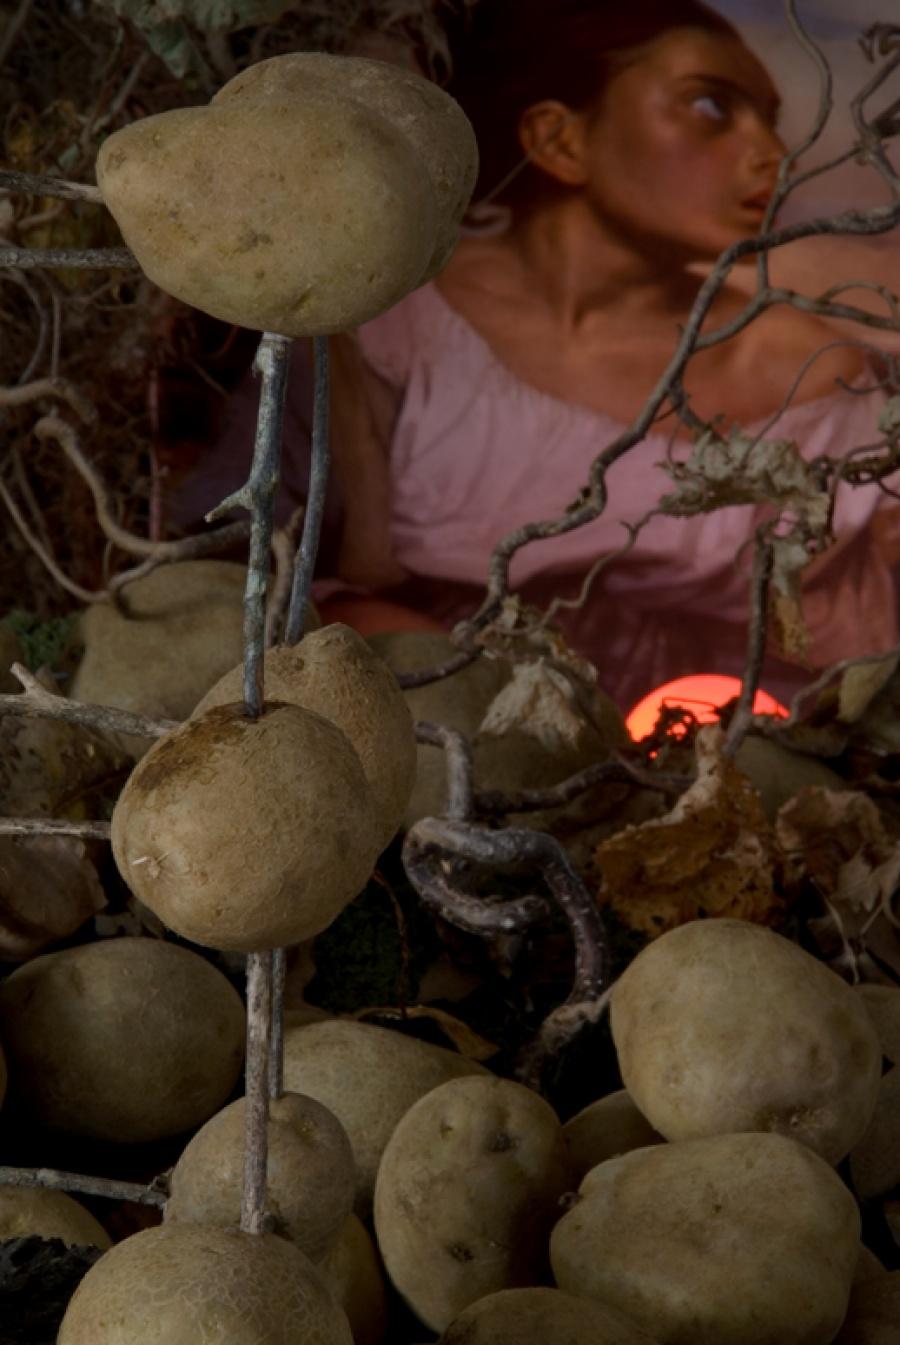 The Potato Days (Delacroix)